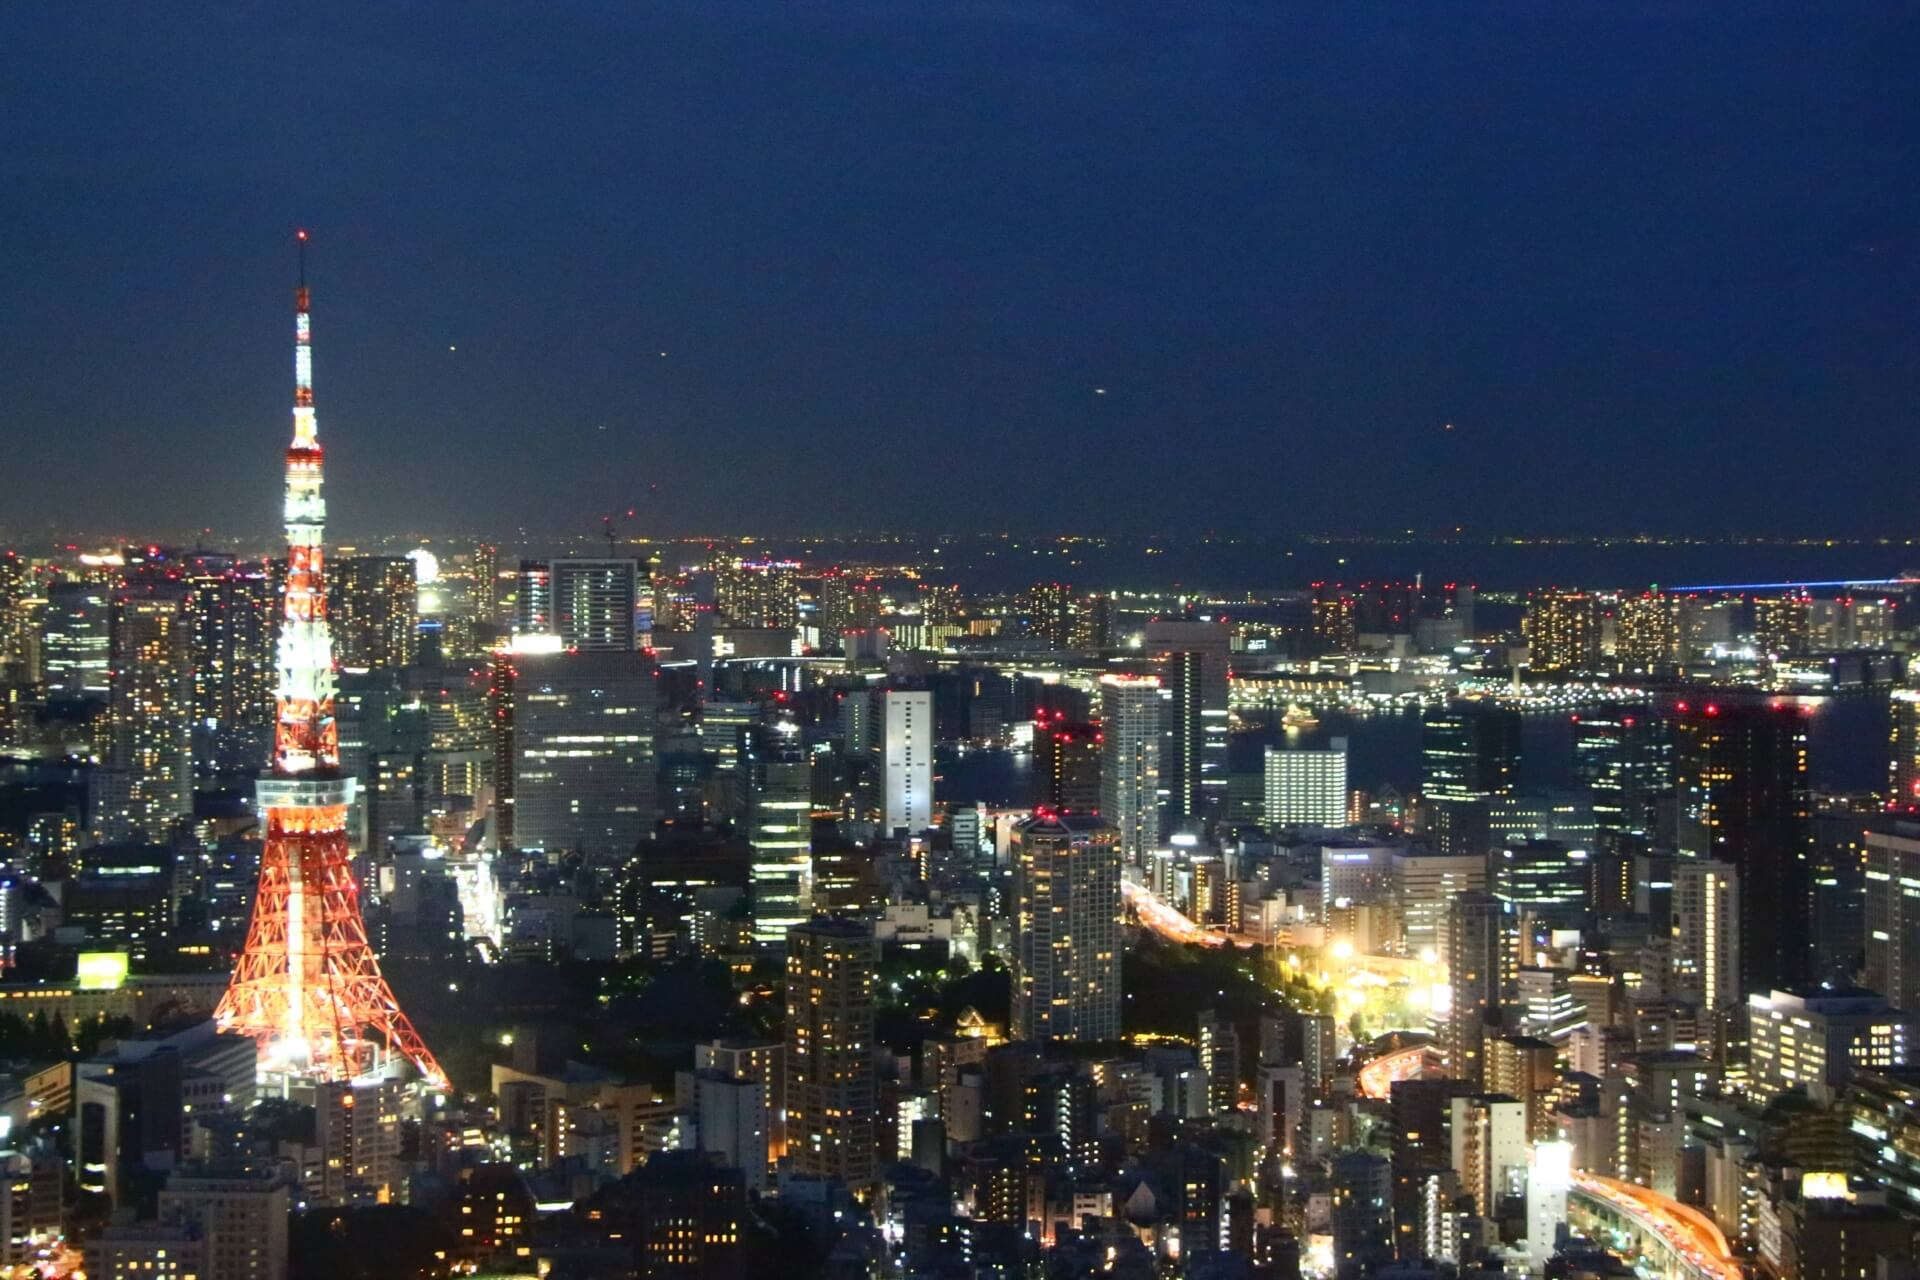 【MIU404】5話あらすじネタバレ感想!6話予告も!星野源と綾野剛がコンビニ店員に!?